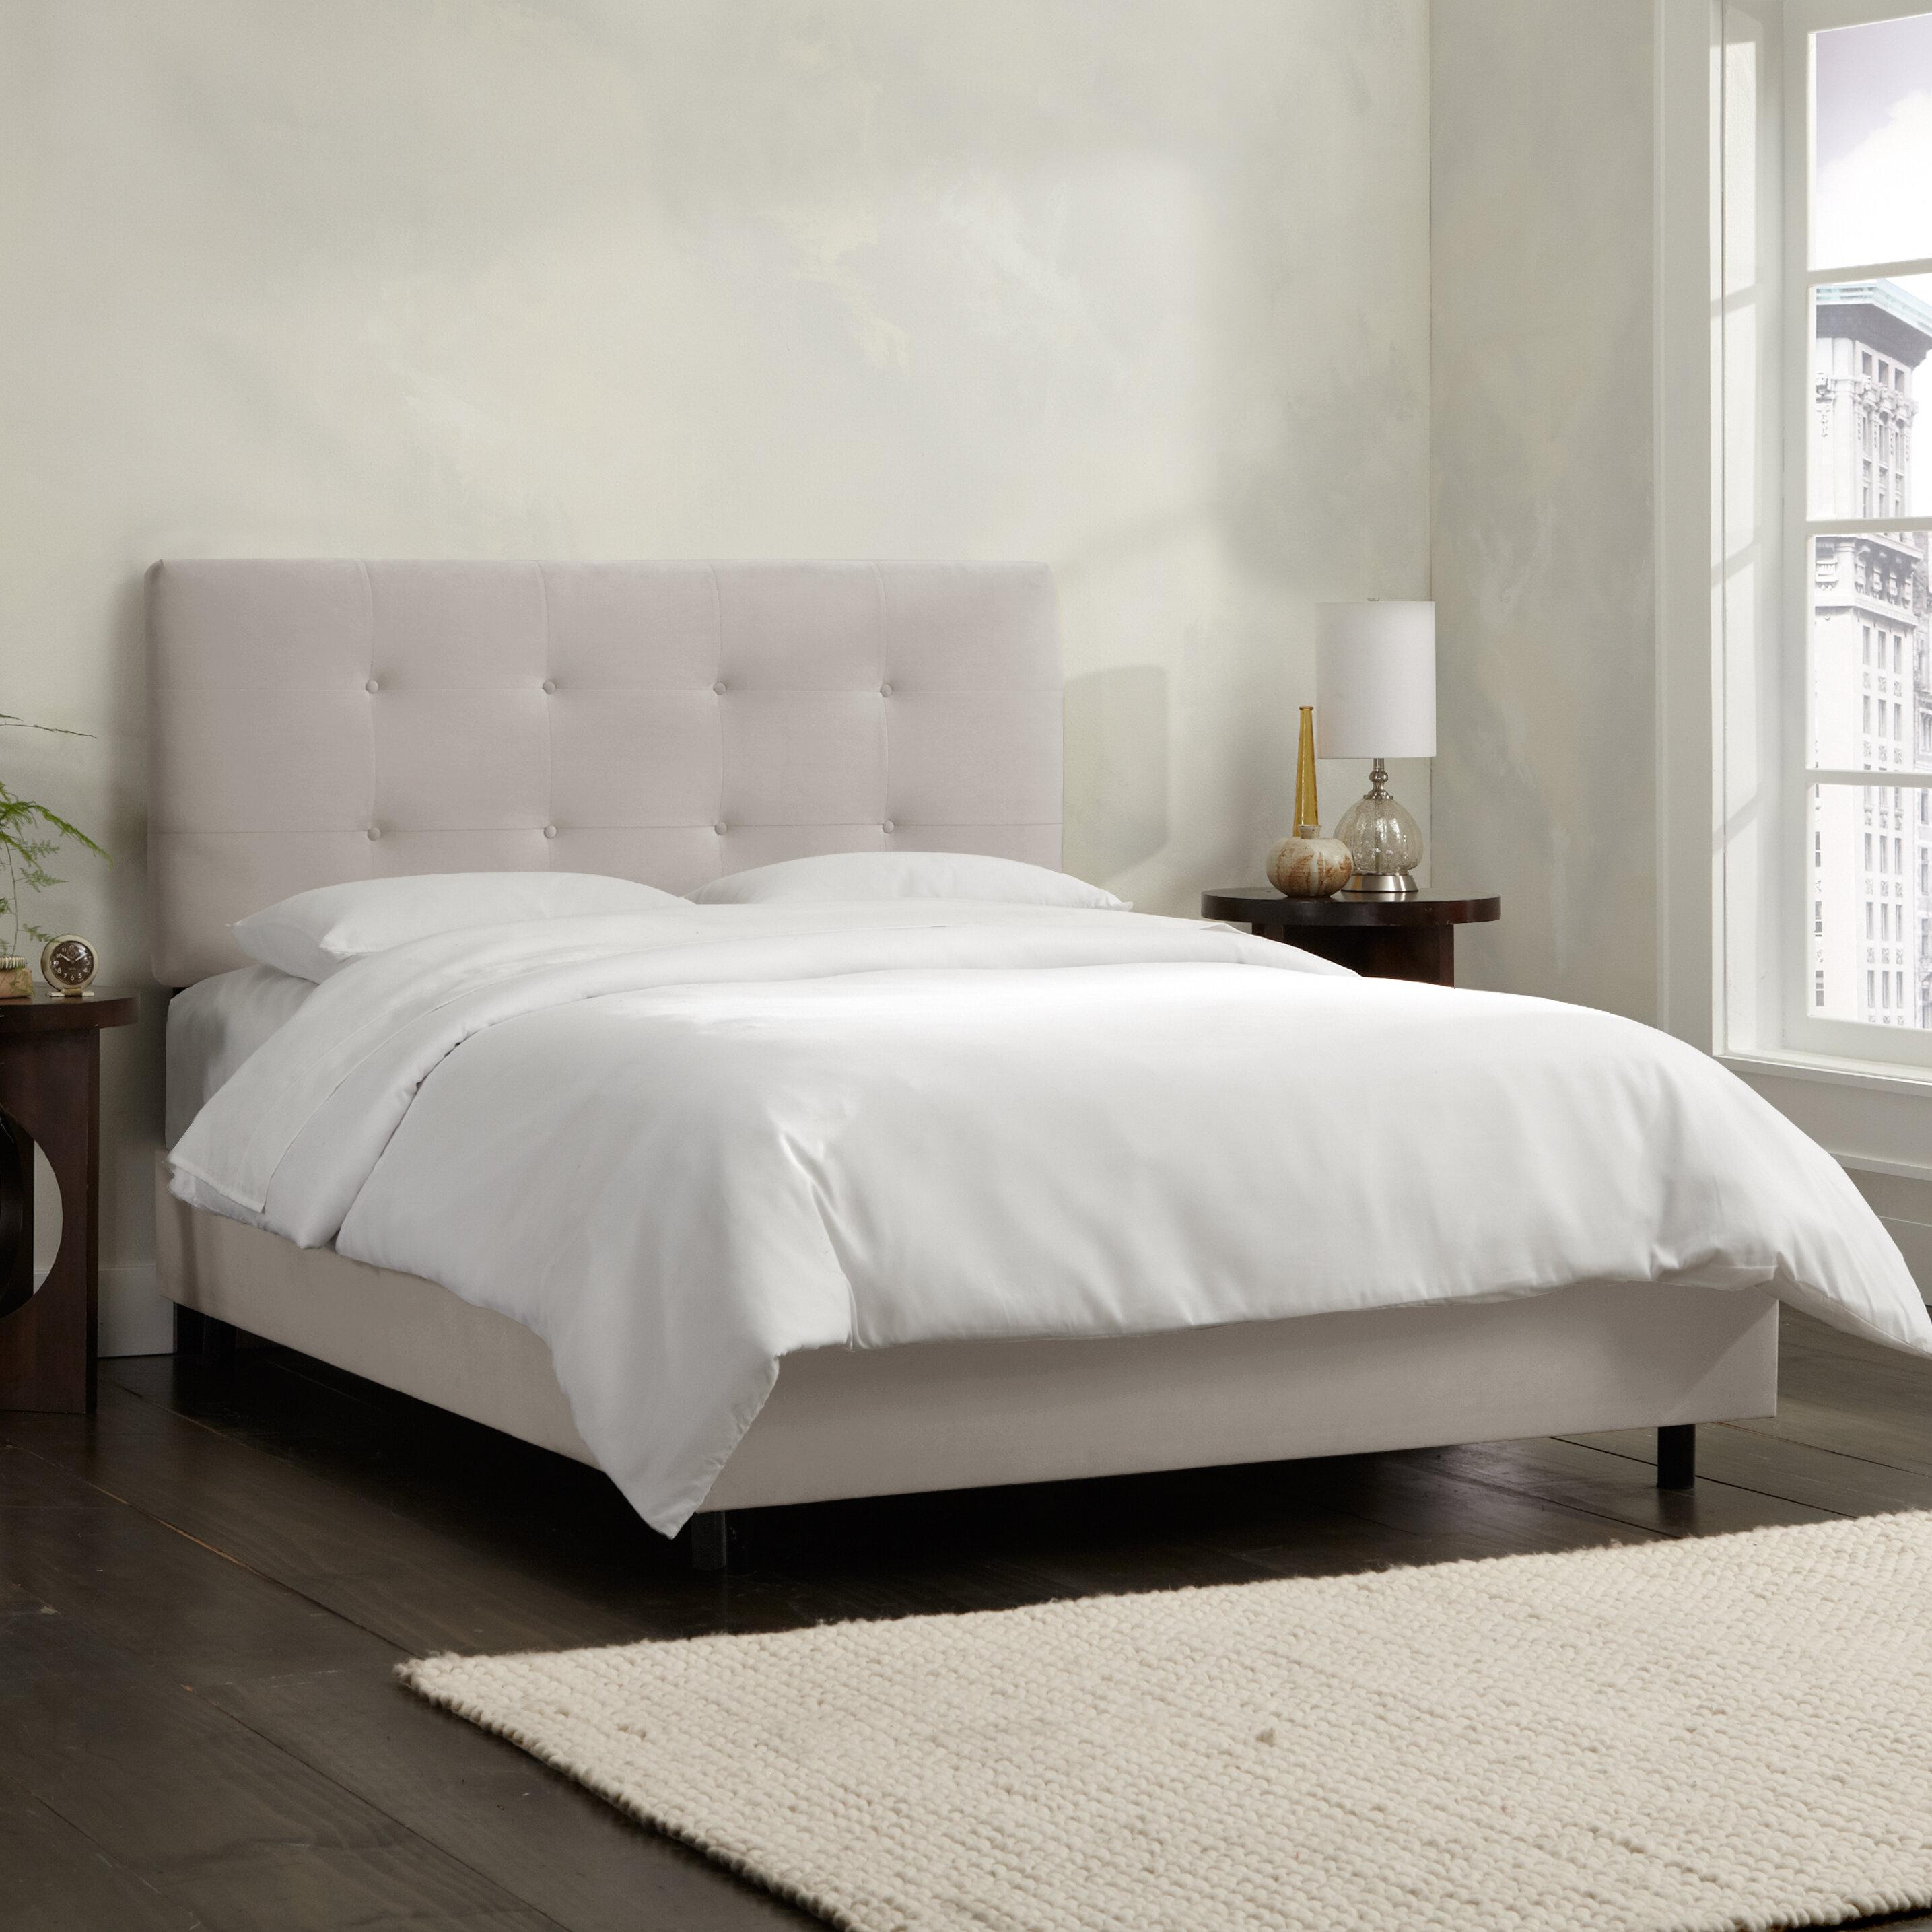 Skyline Furniture Upholstered Standard Bed Reviews Wayfair